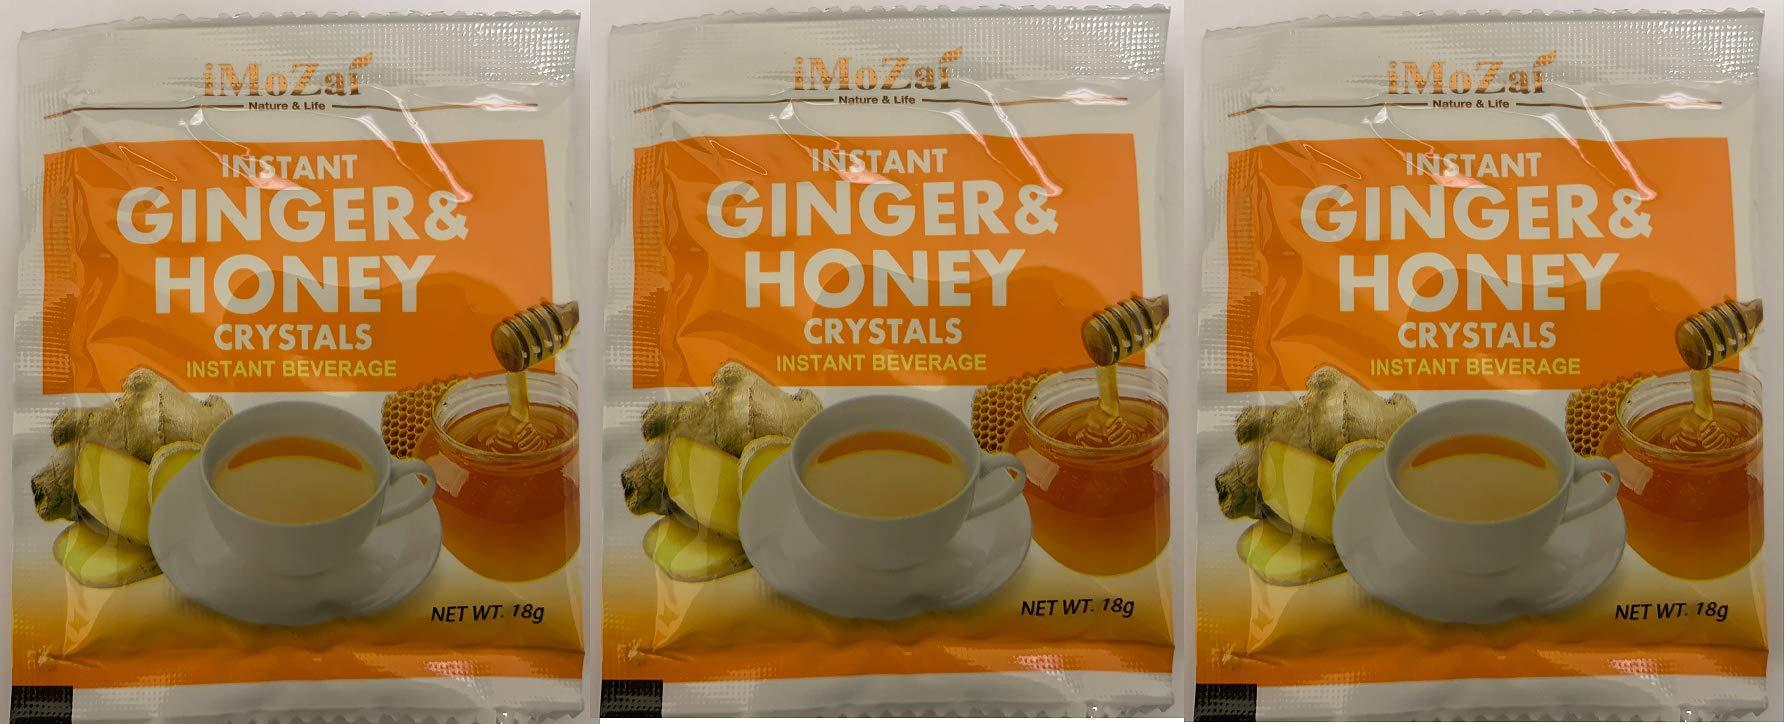 Ramune Japanese Soda Drinks Gift Set 8 Variety Pack Additional 3 Pack Ginger Honey Crystals